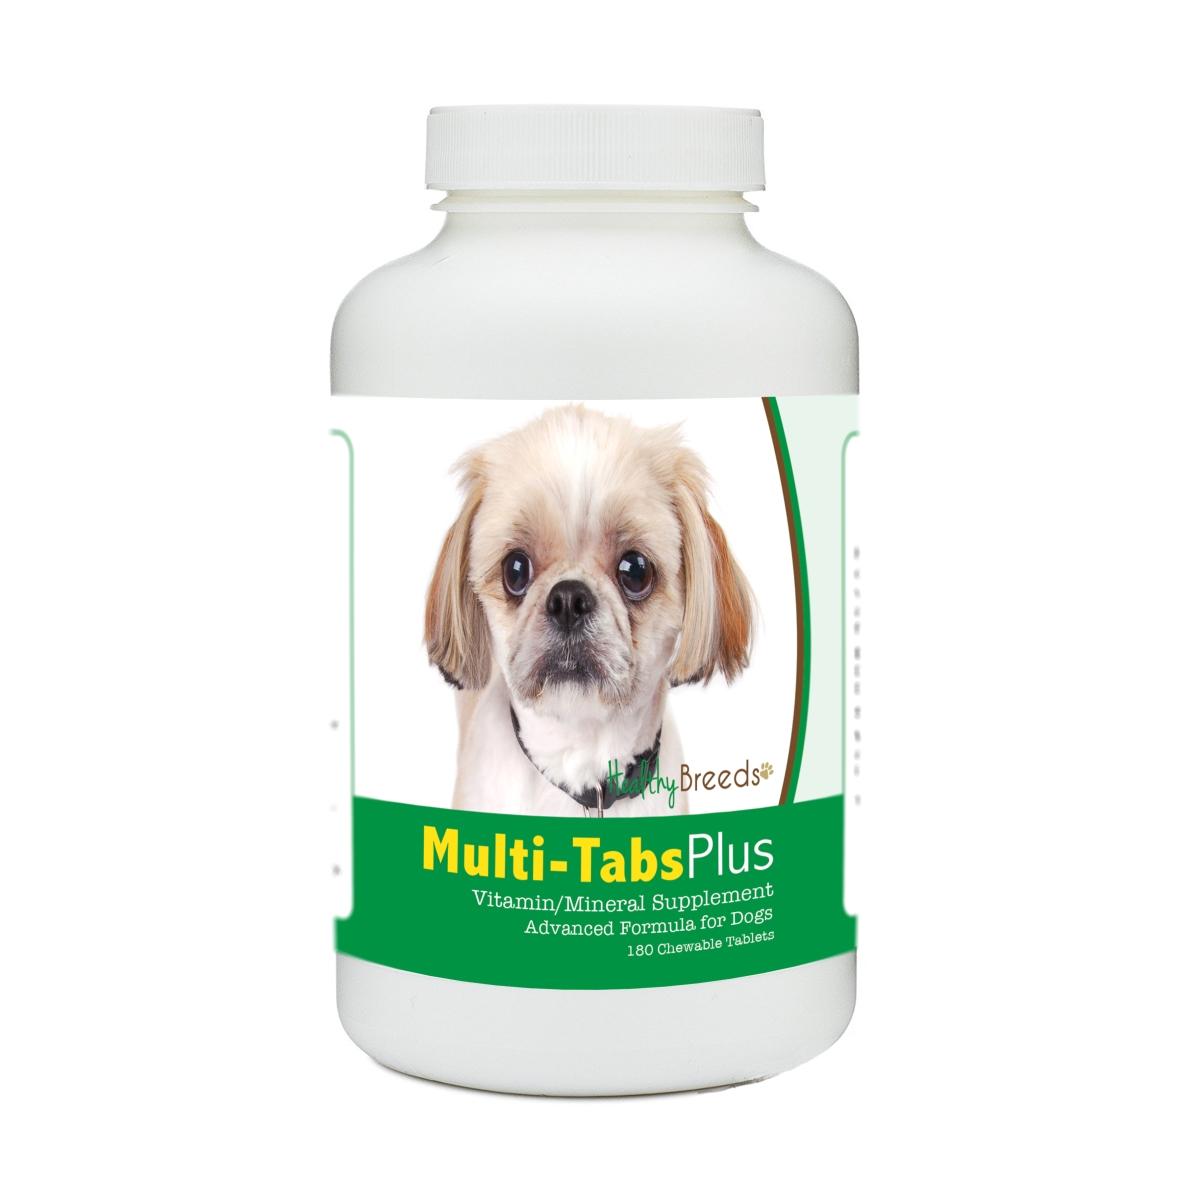 Healthy Breeds 840235176145 Peekapoo Multi-Tabs Plus Chewable Tablets - 180 Count